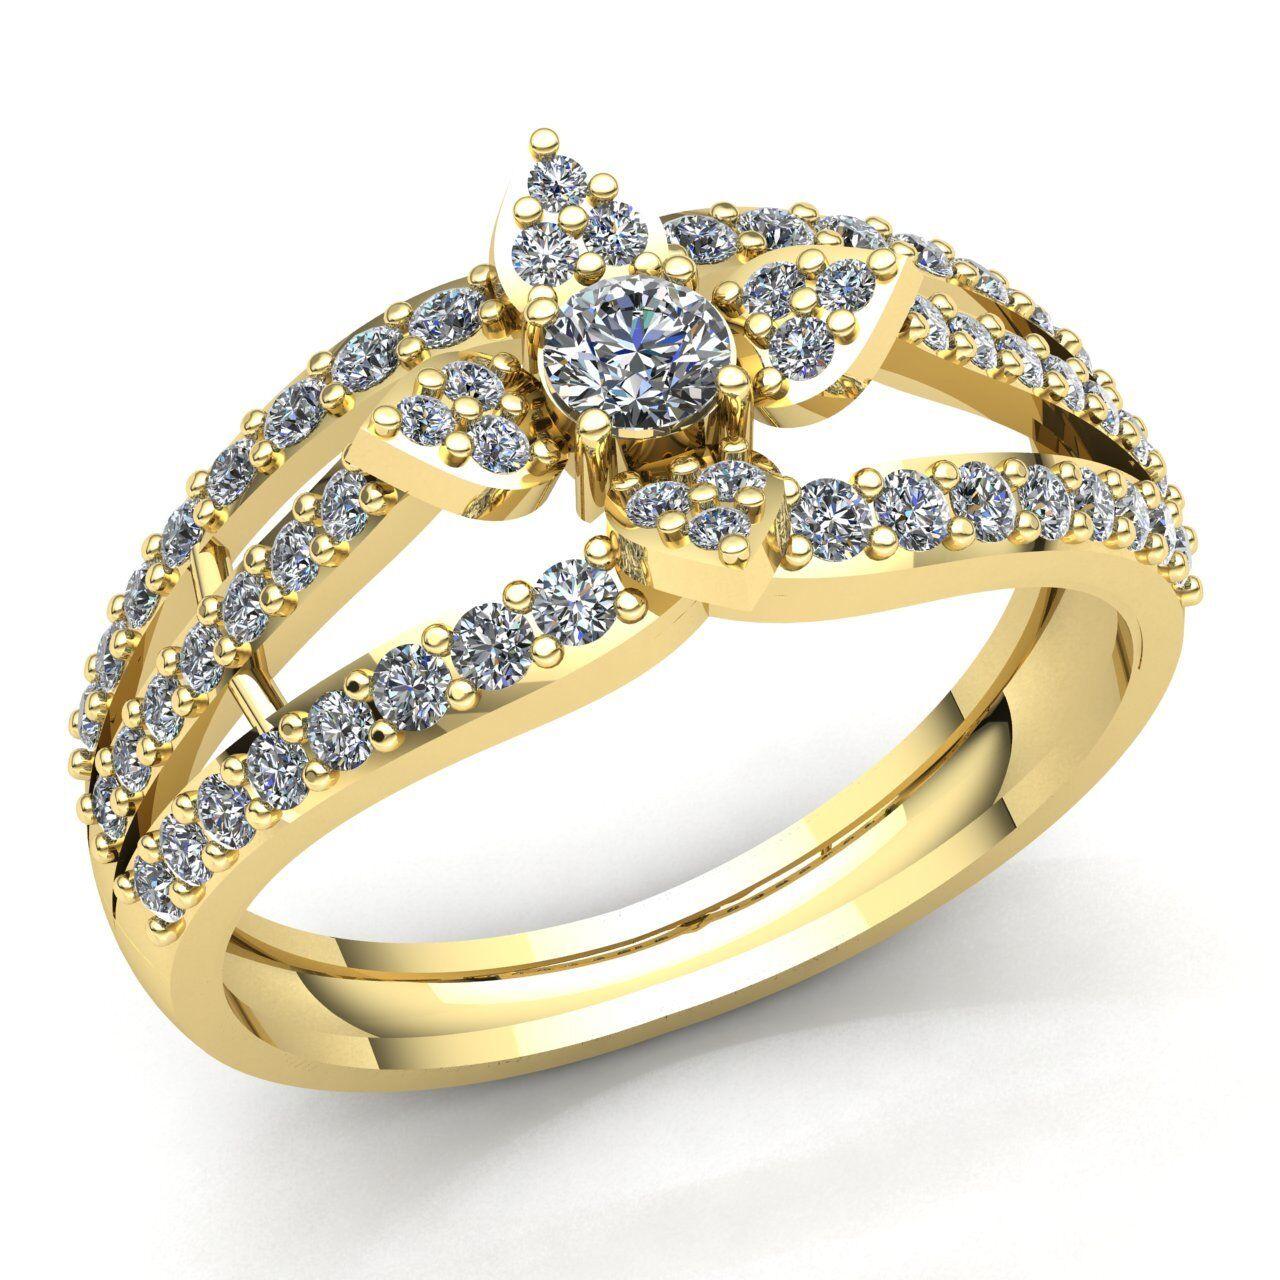 Genuine 1ct Round Cut Diamond Ladies Accent Flower Engagement Ring 10K gold